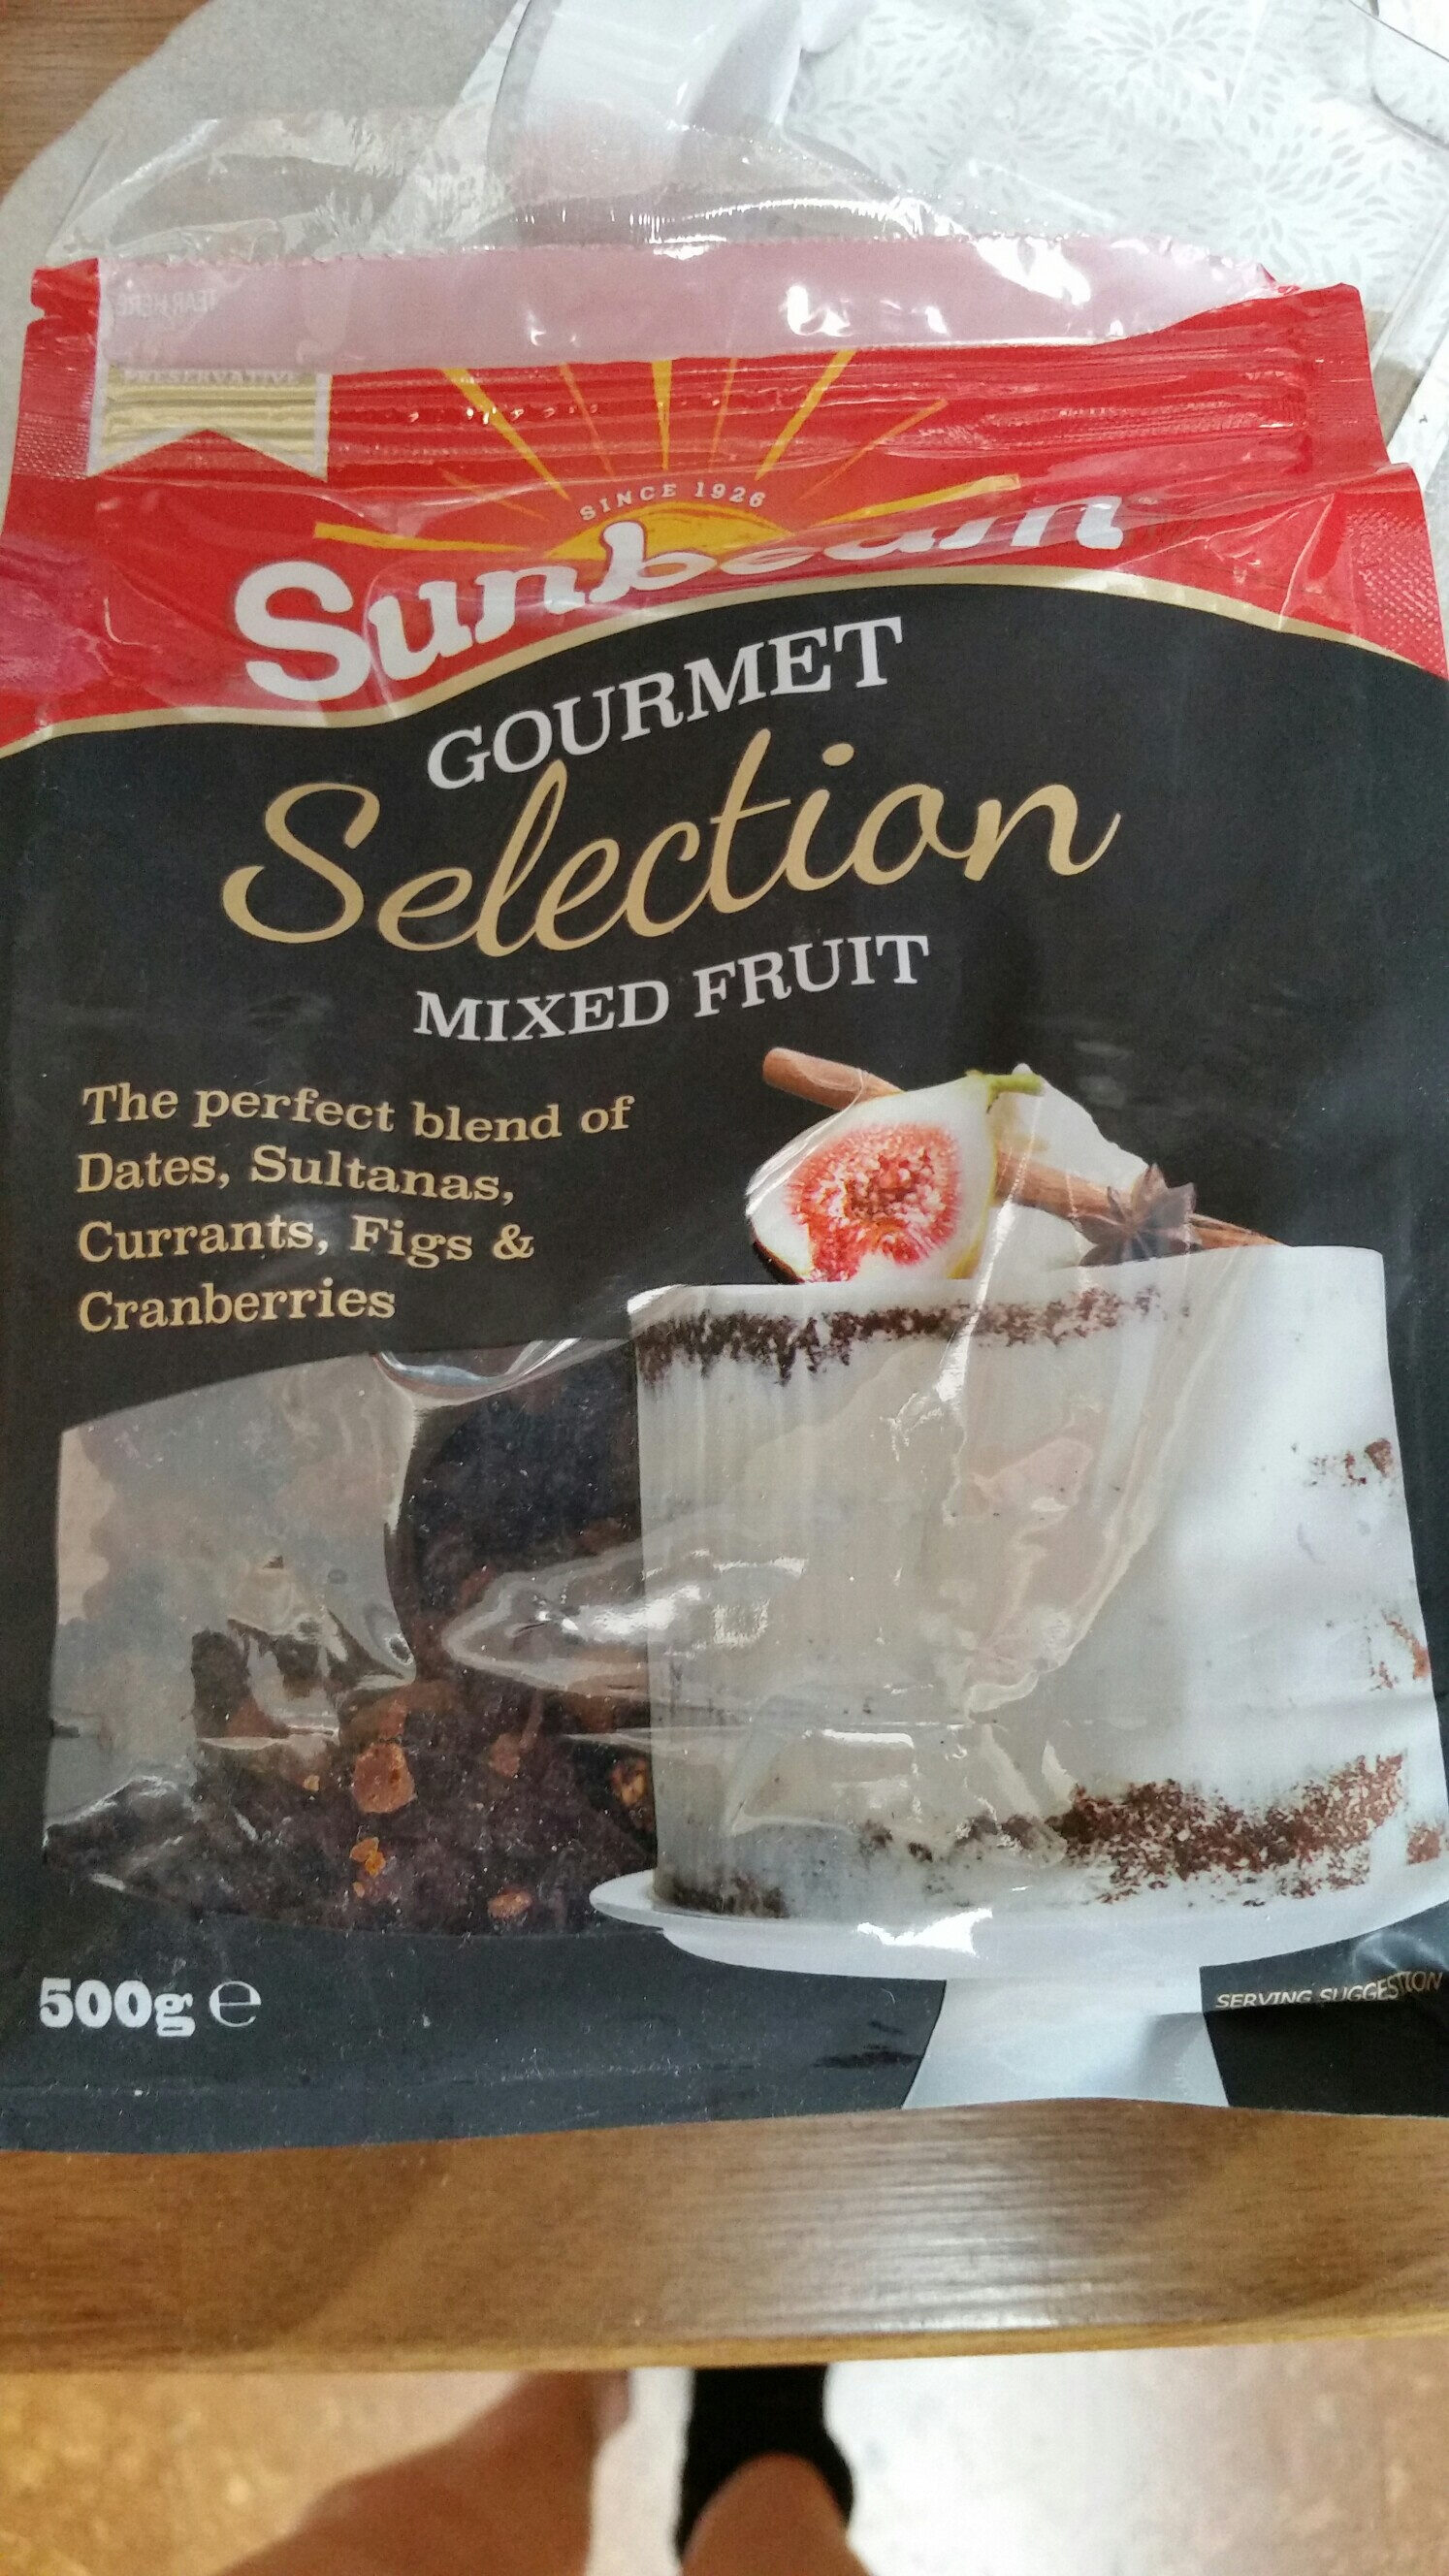 sunbeam gourmet selection mixed fruit - Product - en